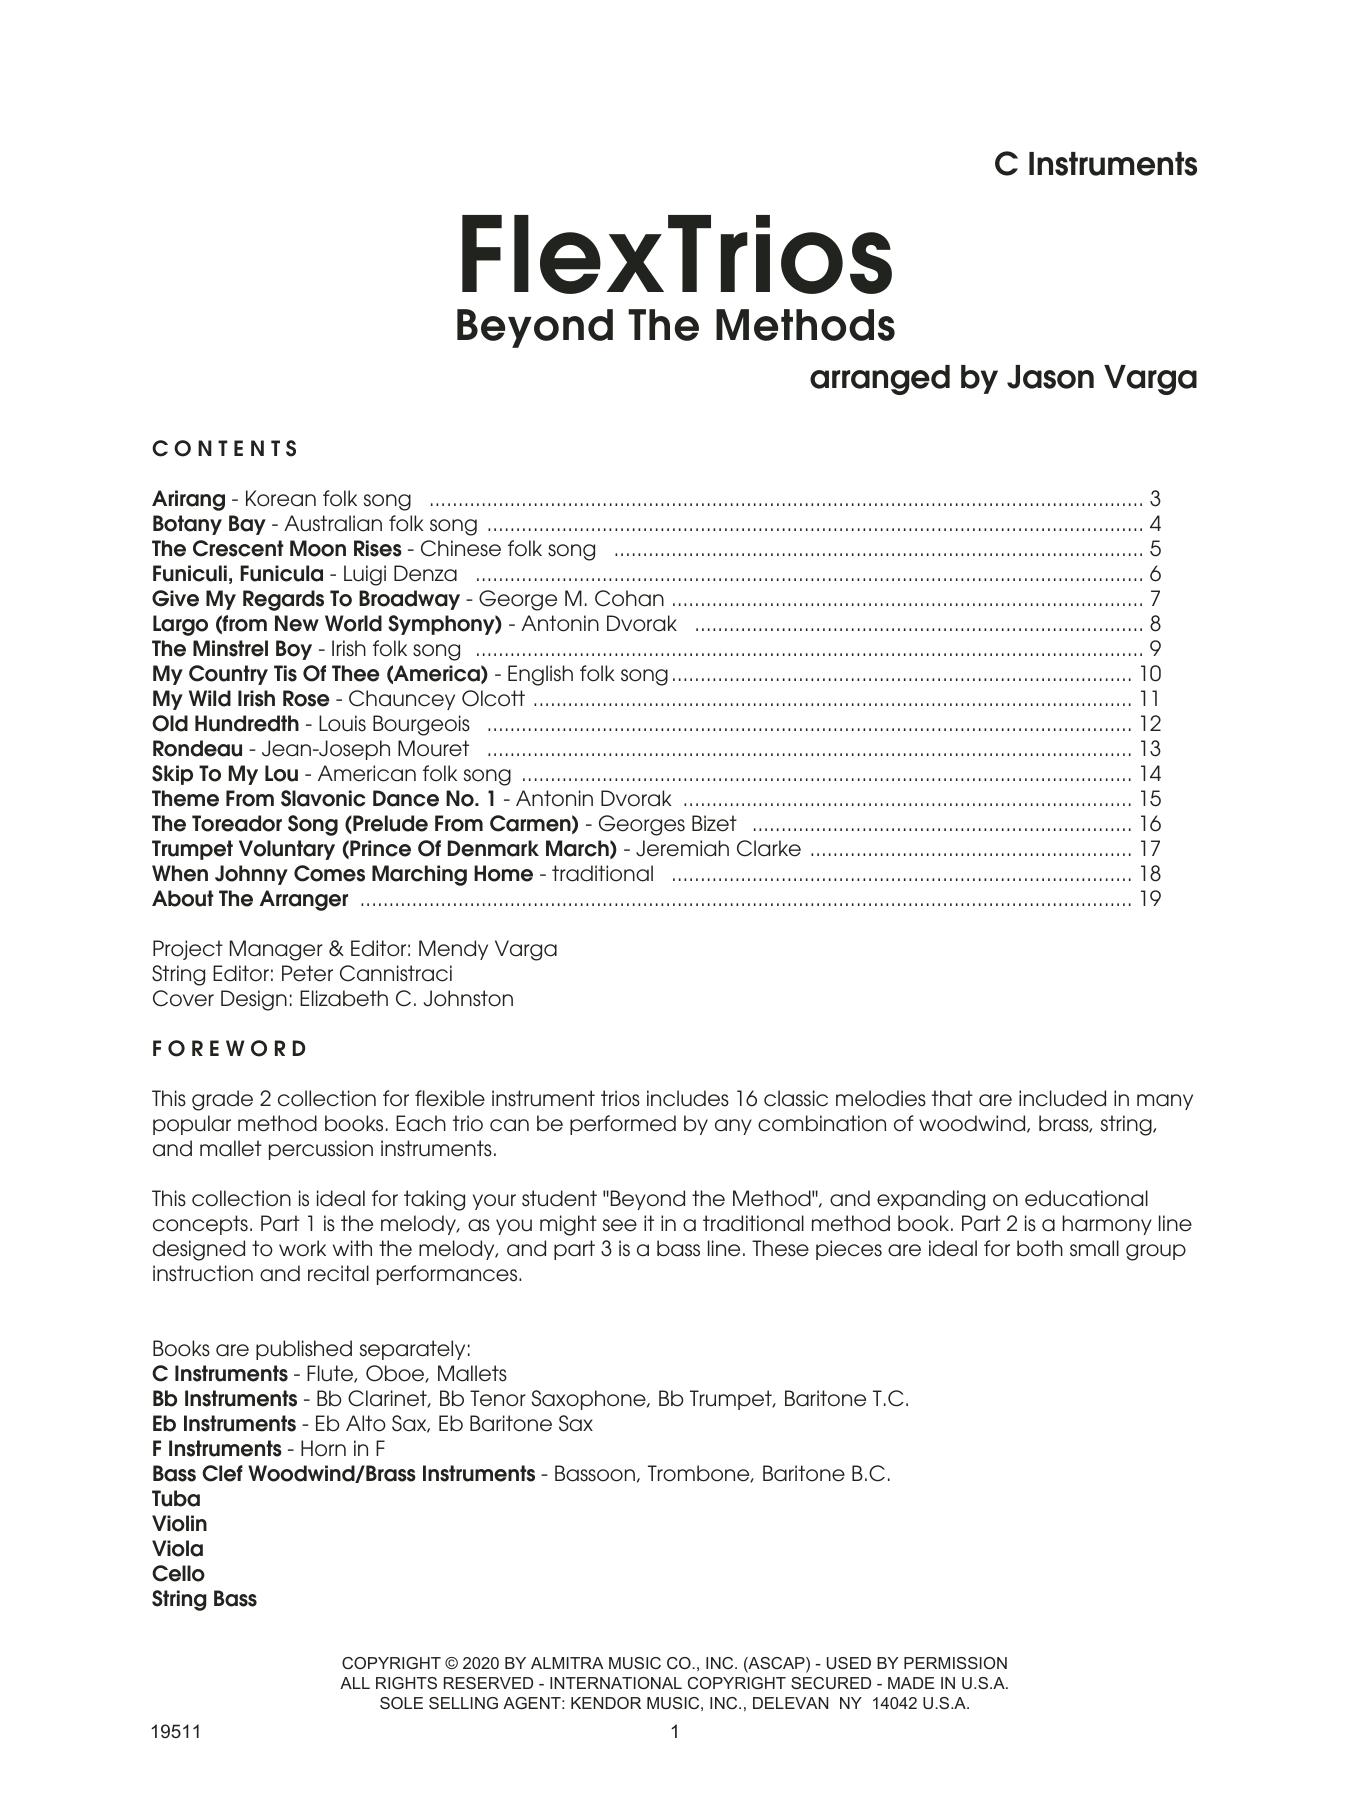 Jason Varga Flextrios - Beyond The Methods (16 Pieces) - C Instruments sheet music notes printable PDF score